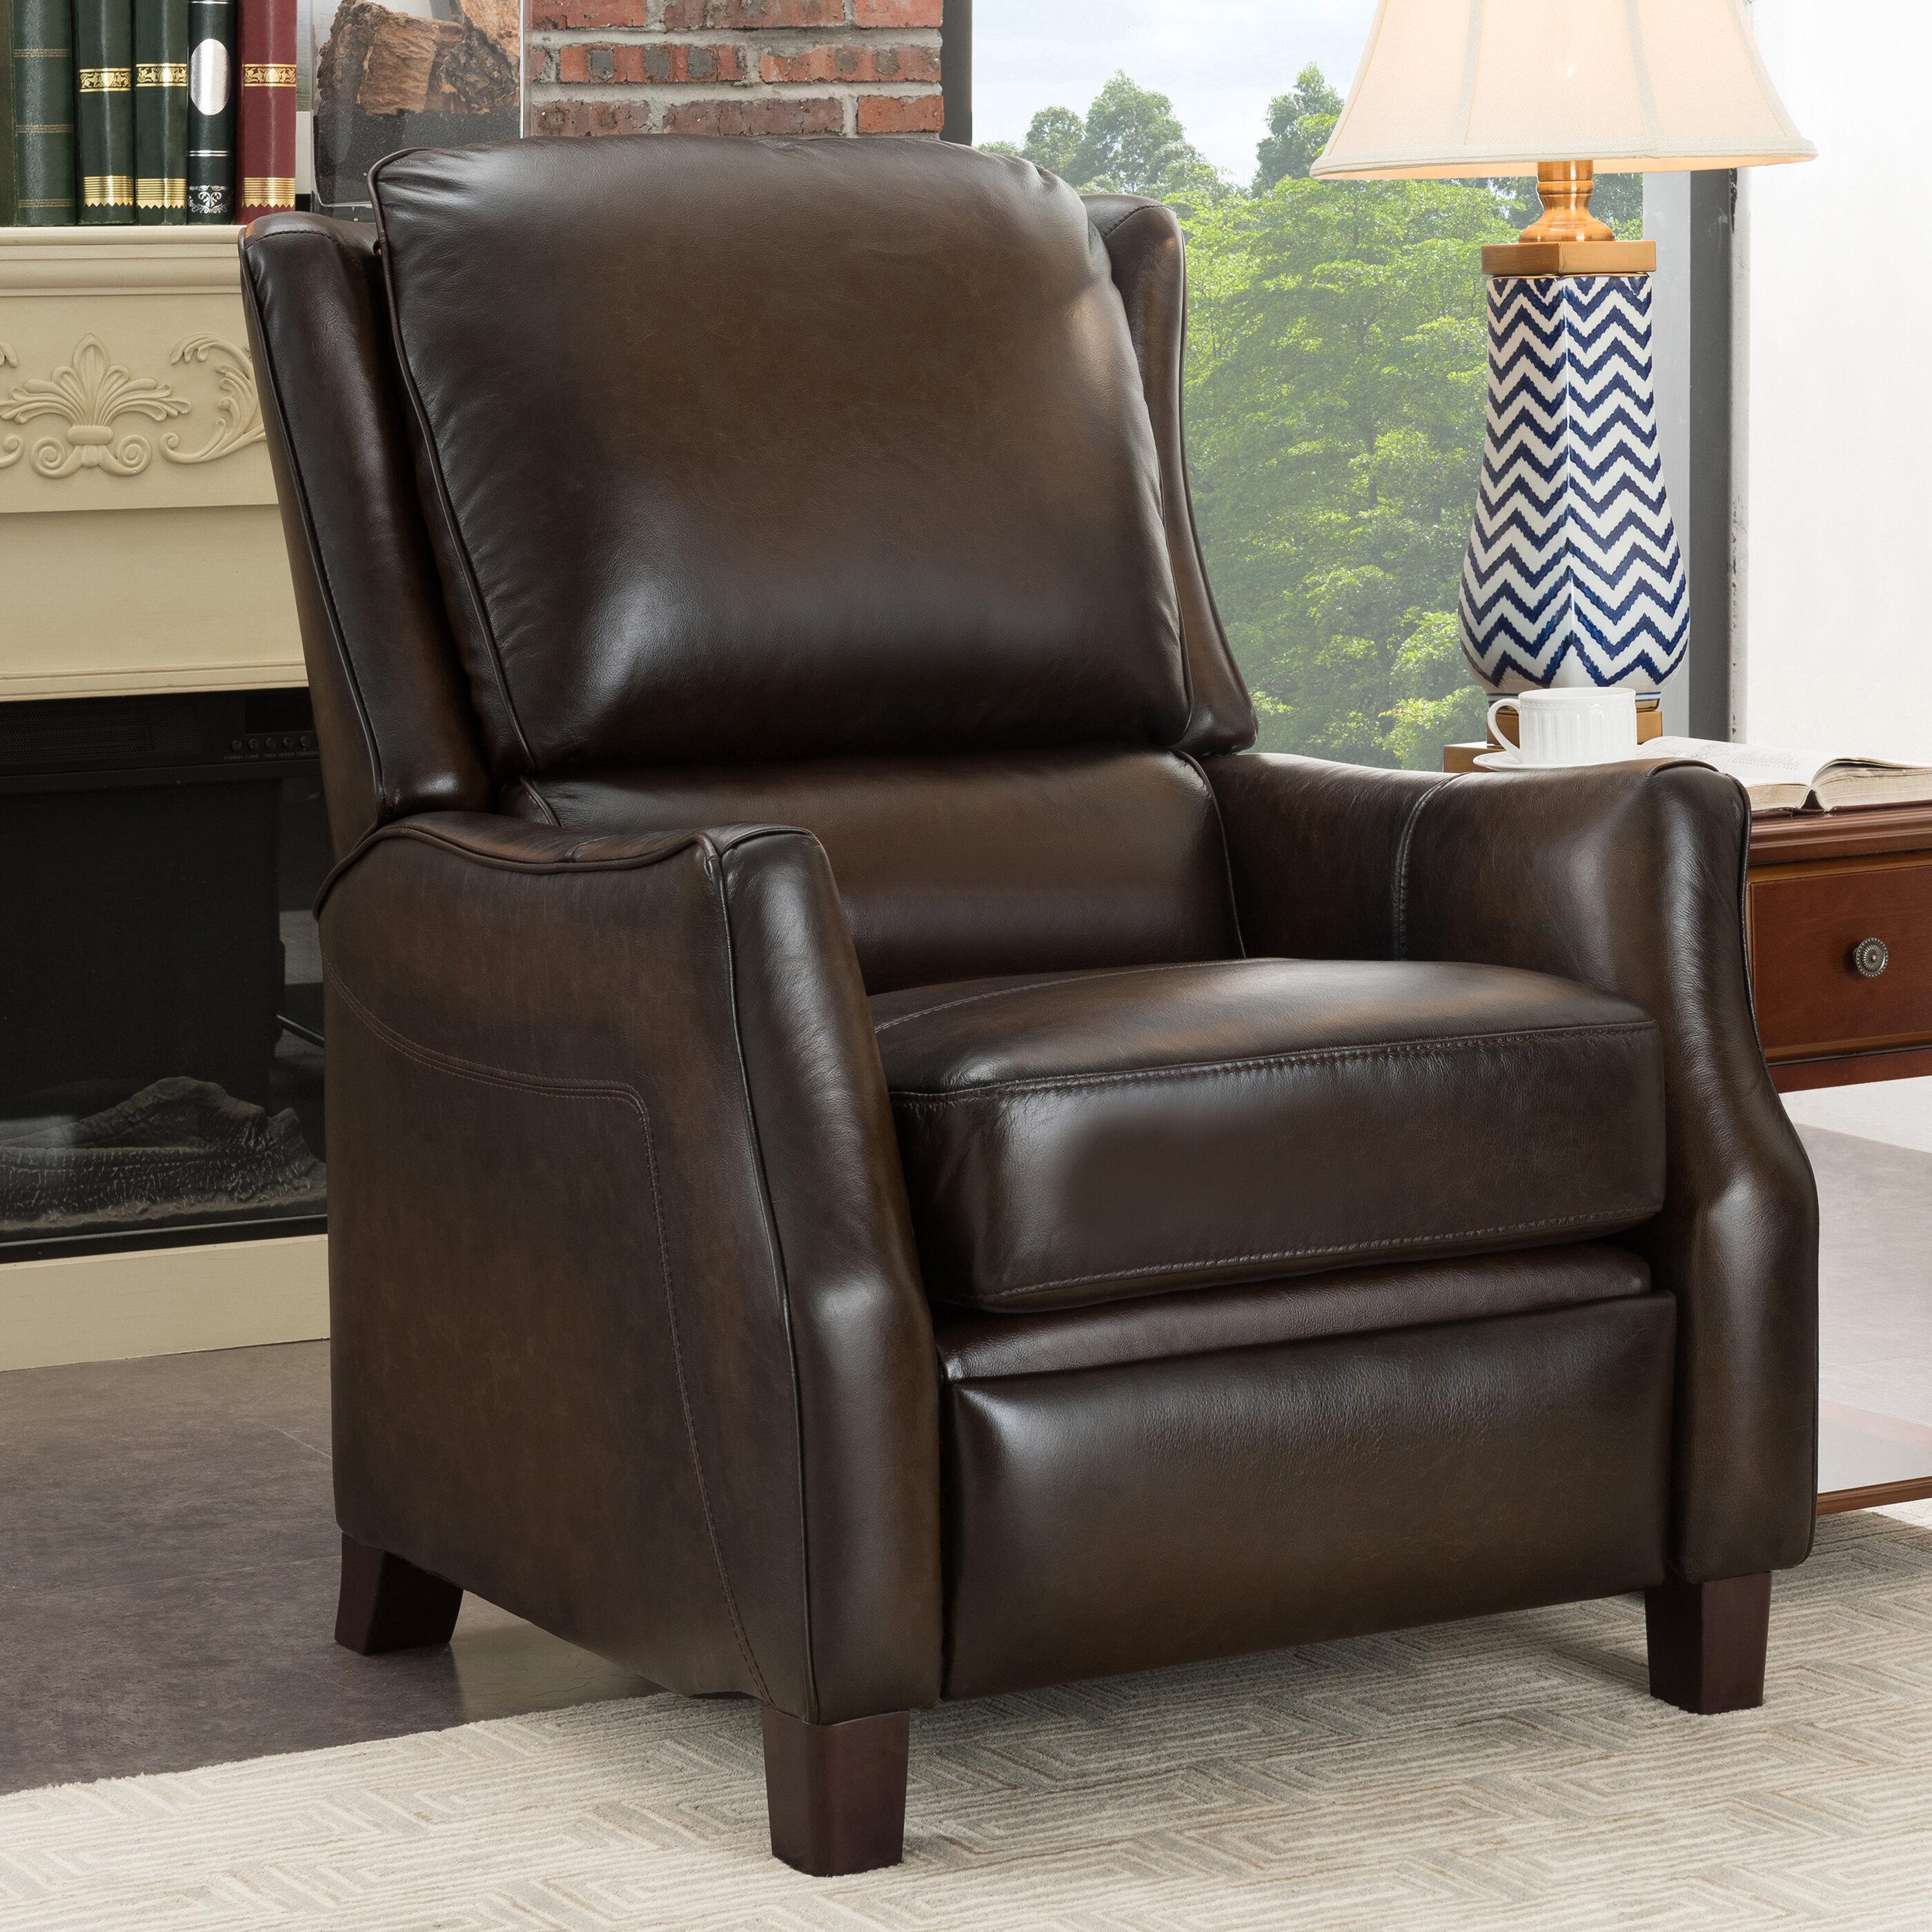 Super Yeates Premium Leather Manual Recliner Bralicious Painted Fabric Chair Ideas Braliciousco